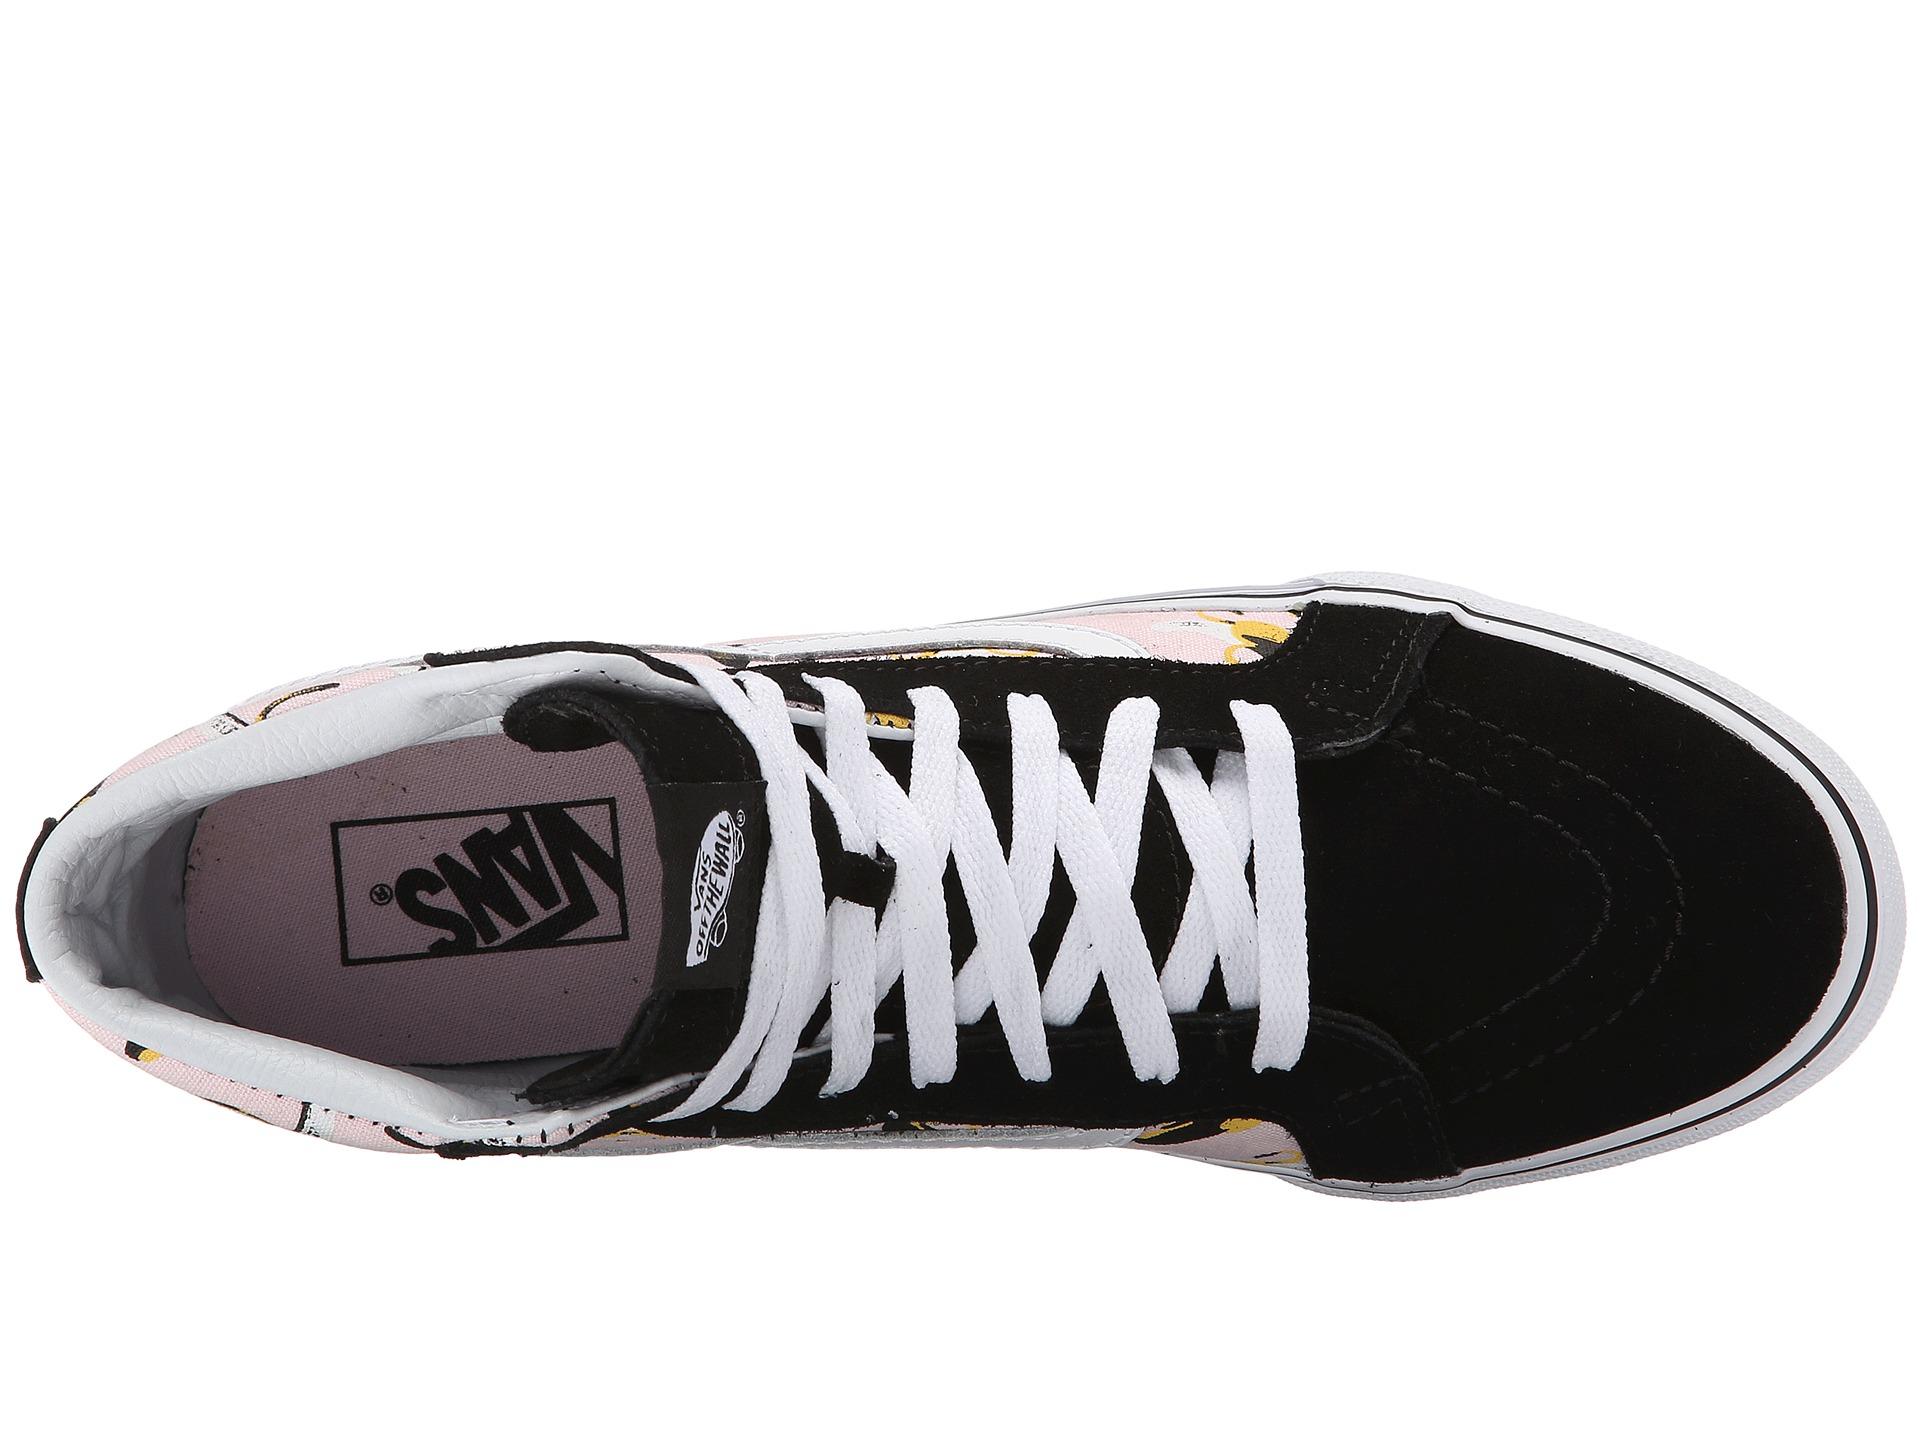 01d65901bc1 Lyst - Vans Sk8-hi Slim in Black